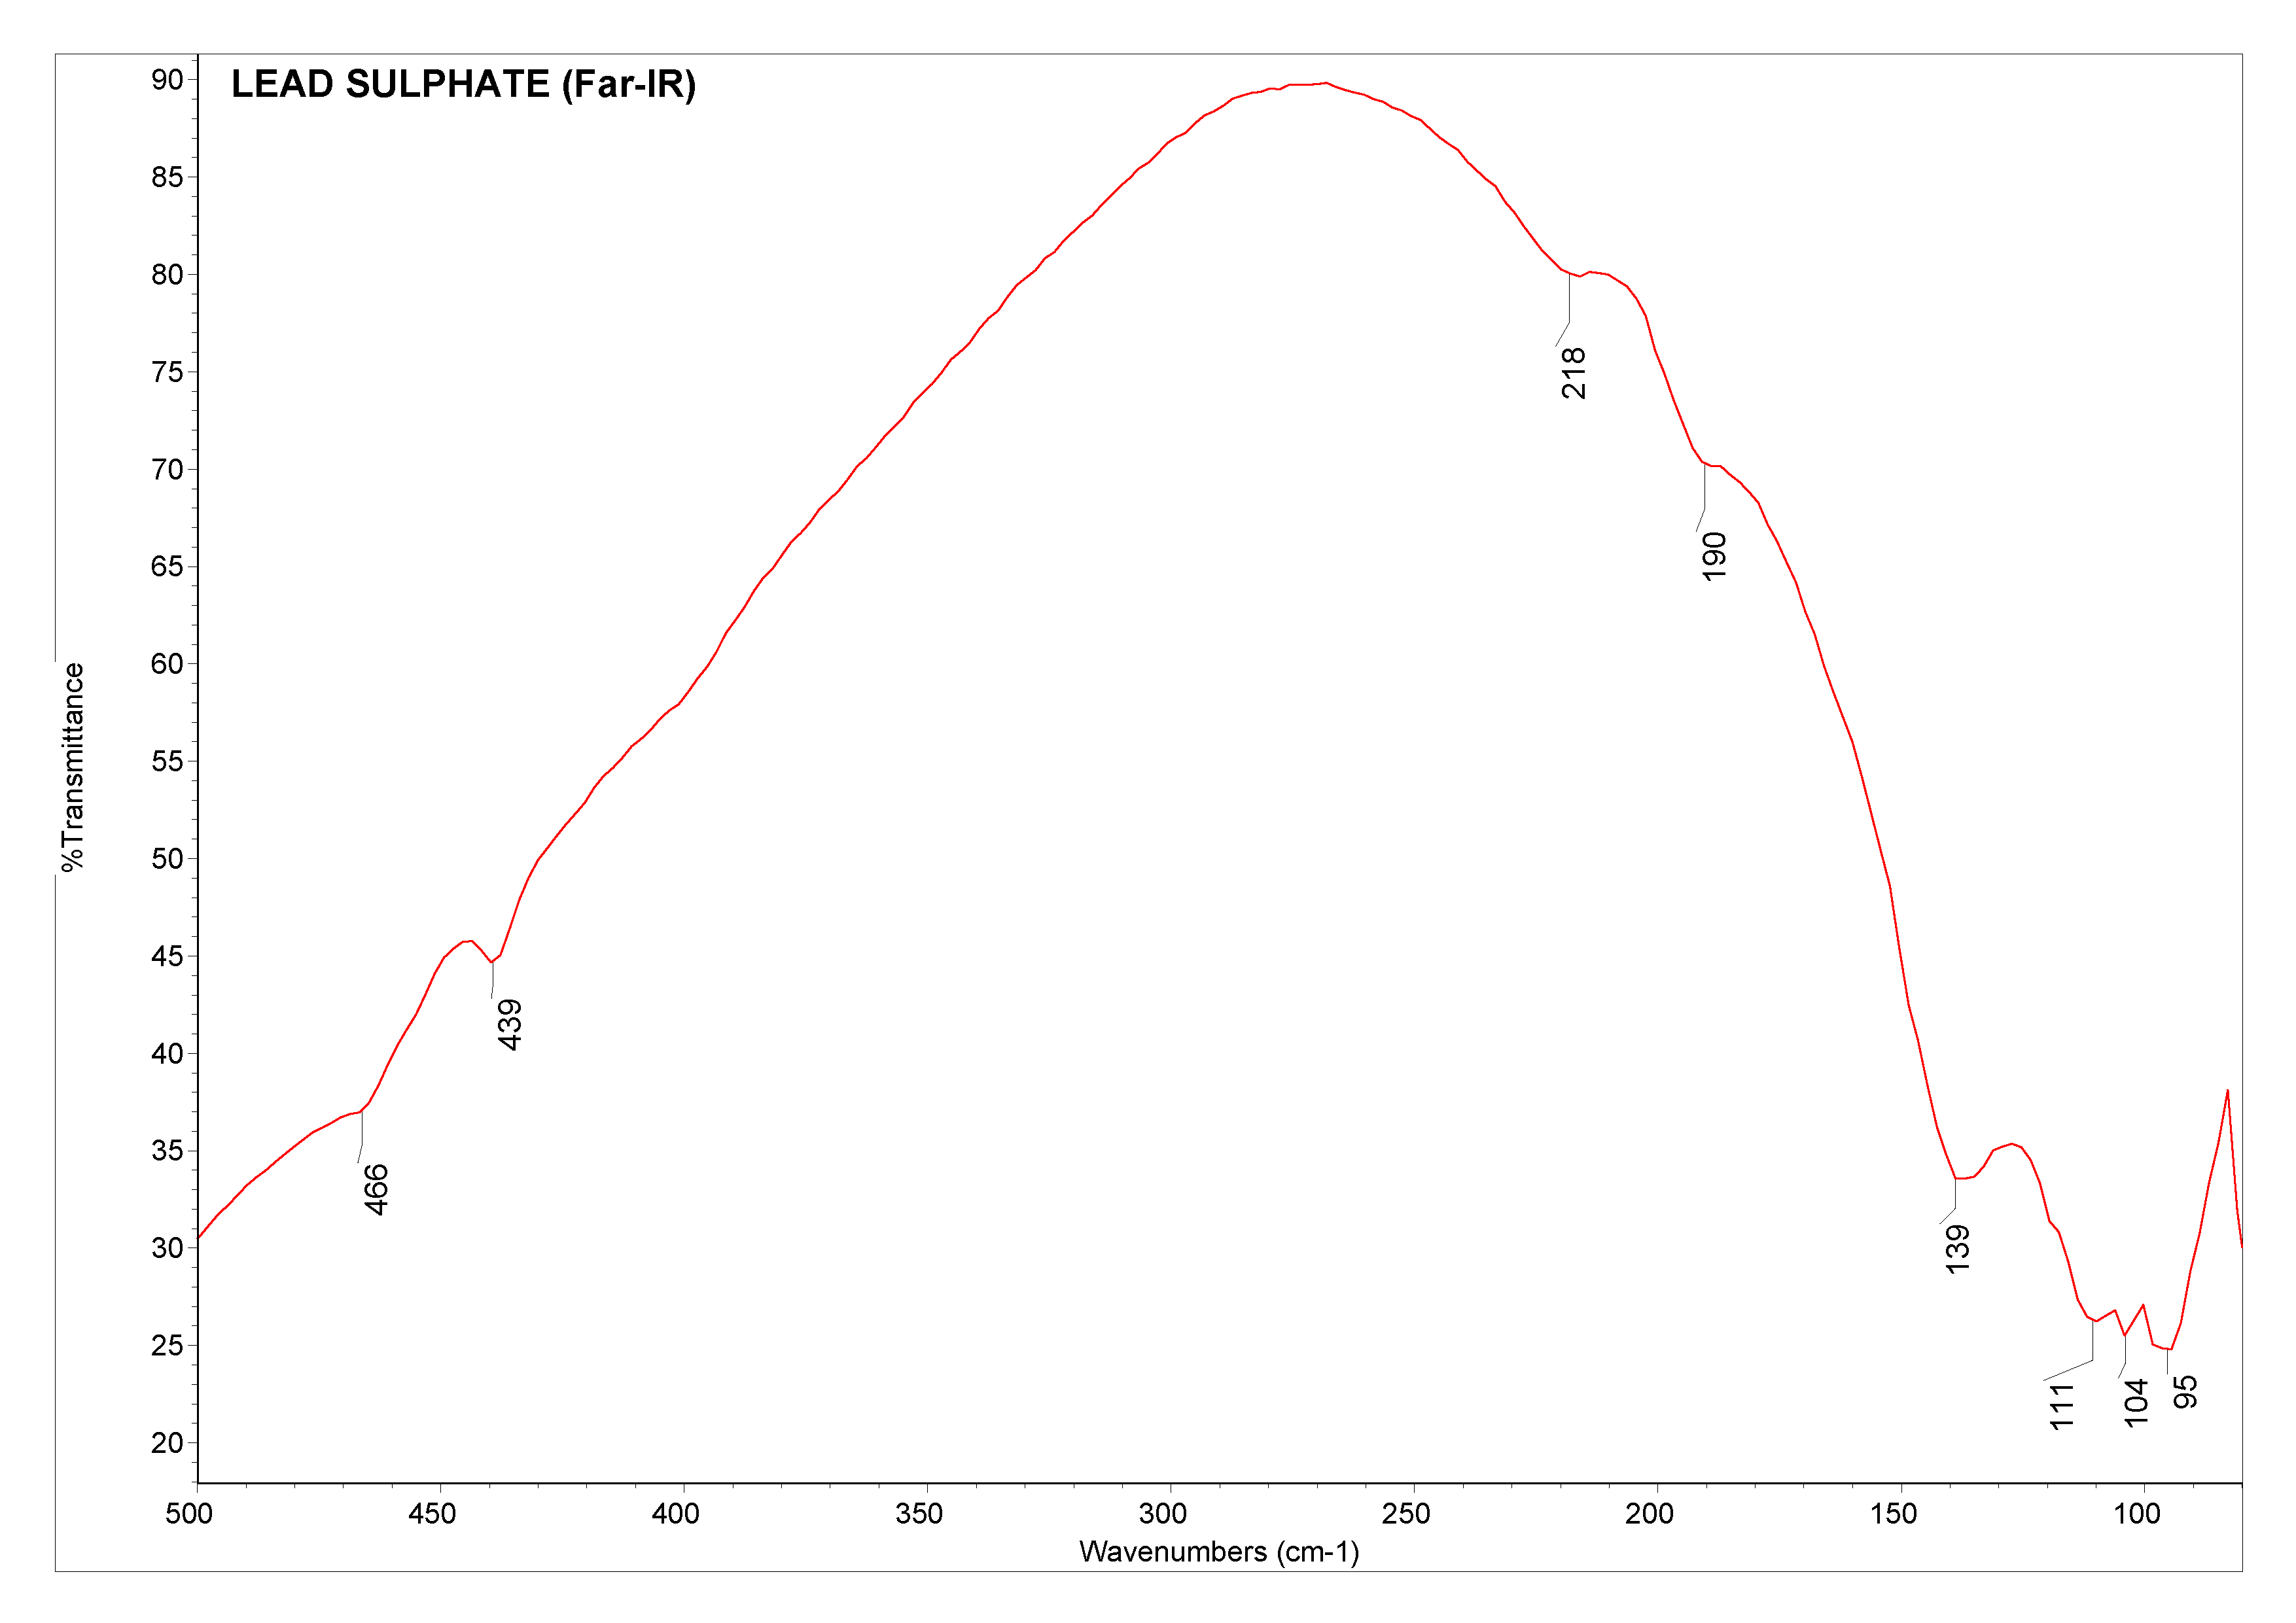 Lead sulphate (Far-IR)